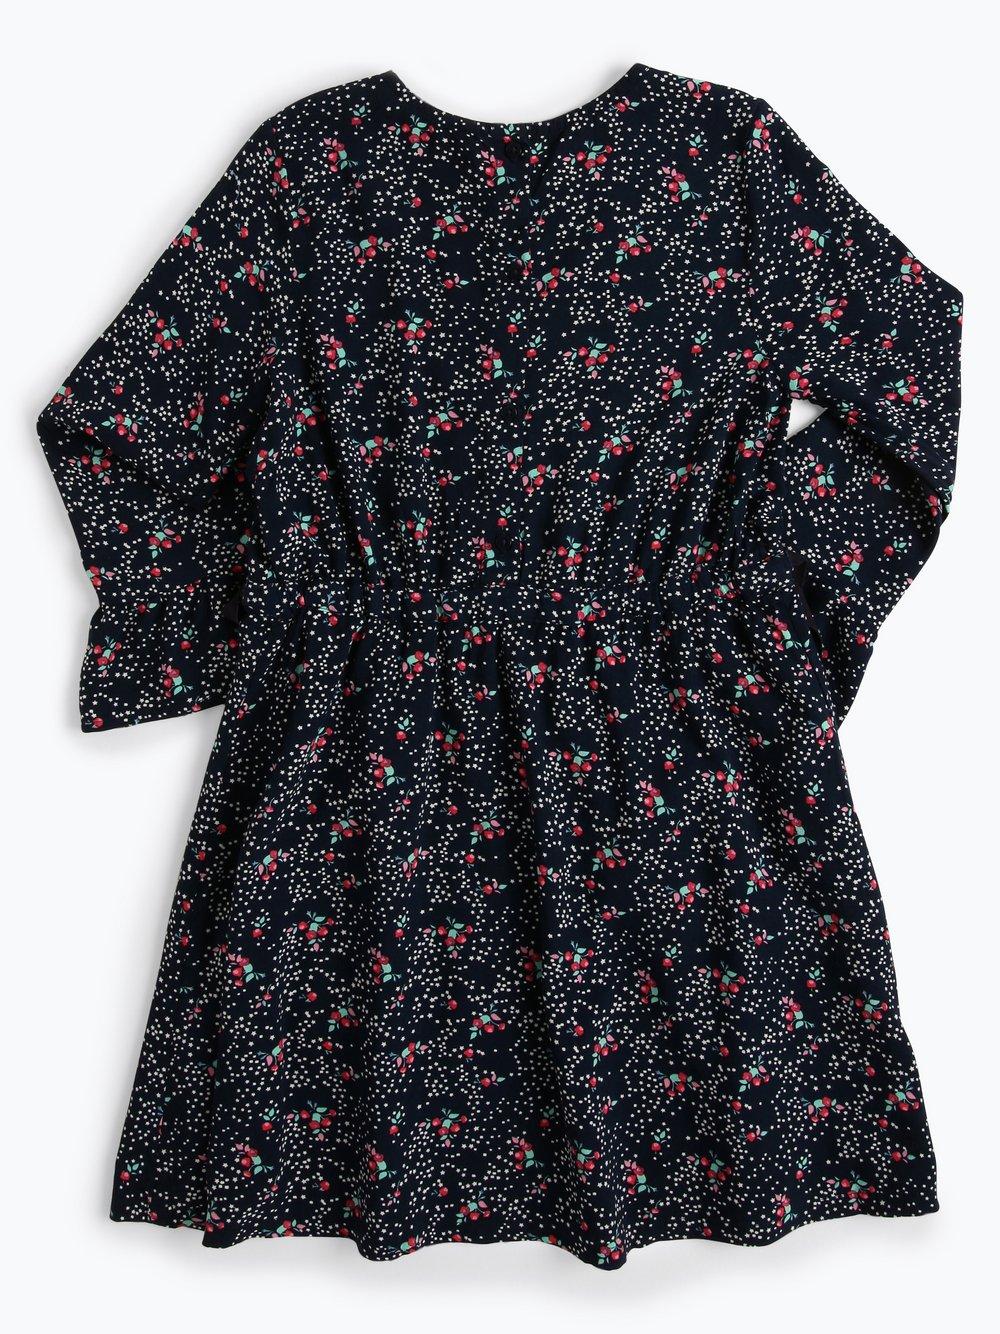 better the best cheap prices Tom Tailor Mädchen Kleid online kaufen | VANGRAAF.COM